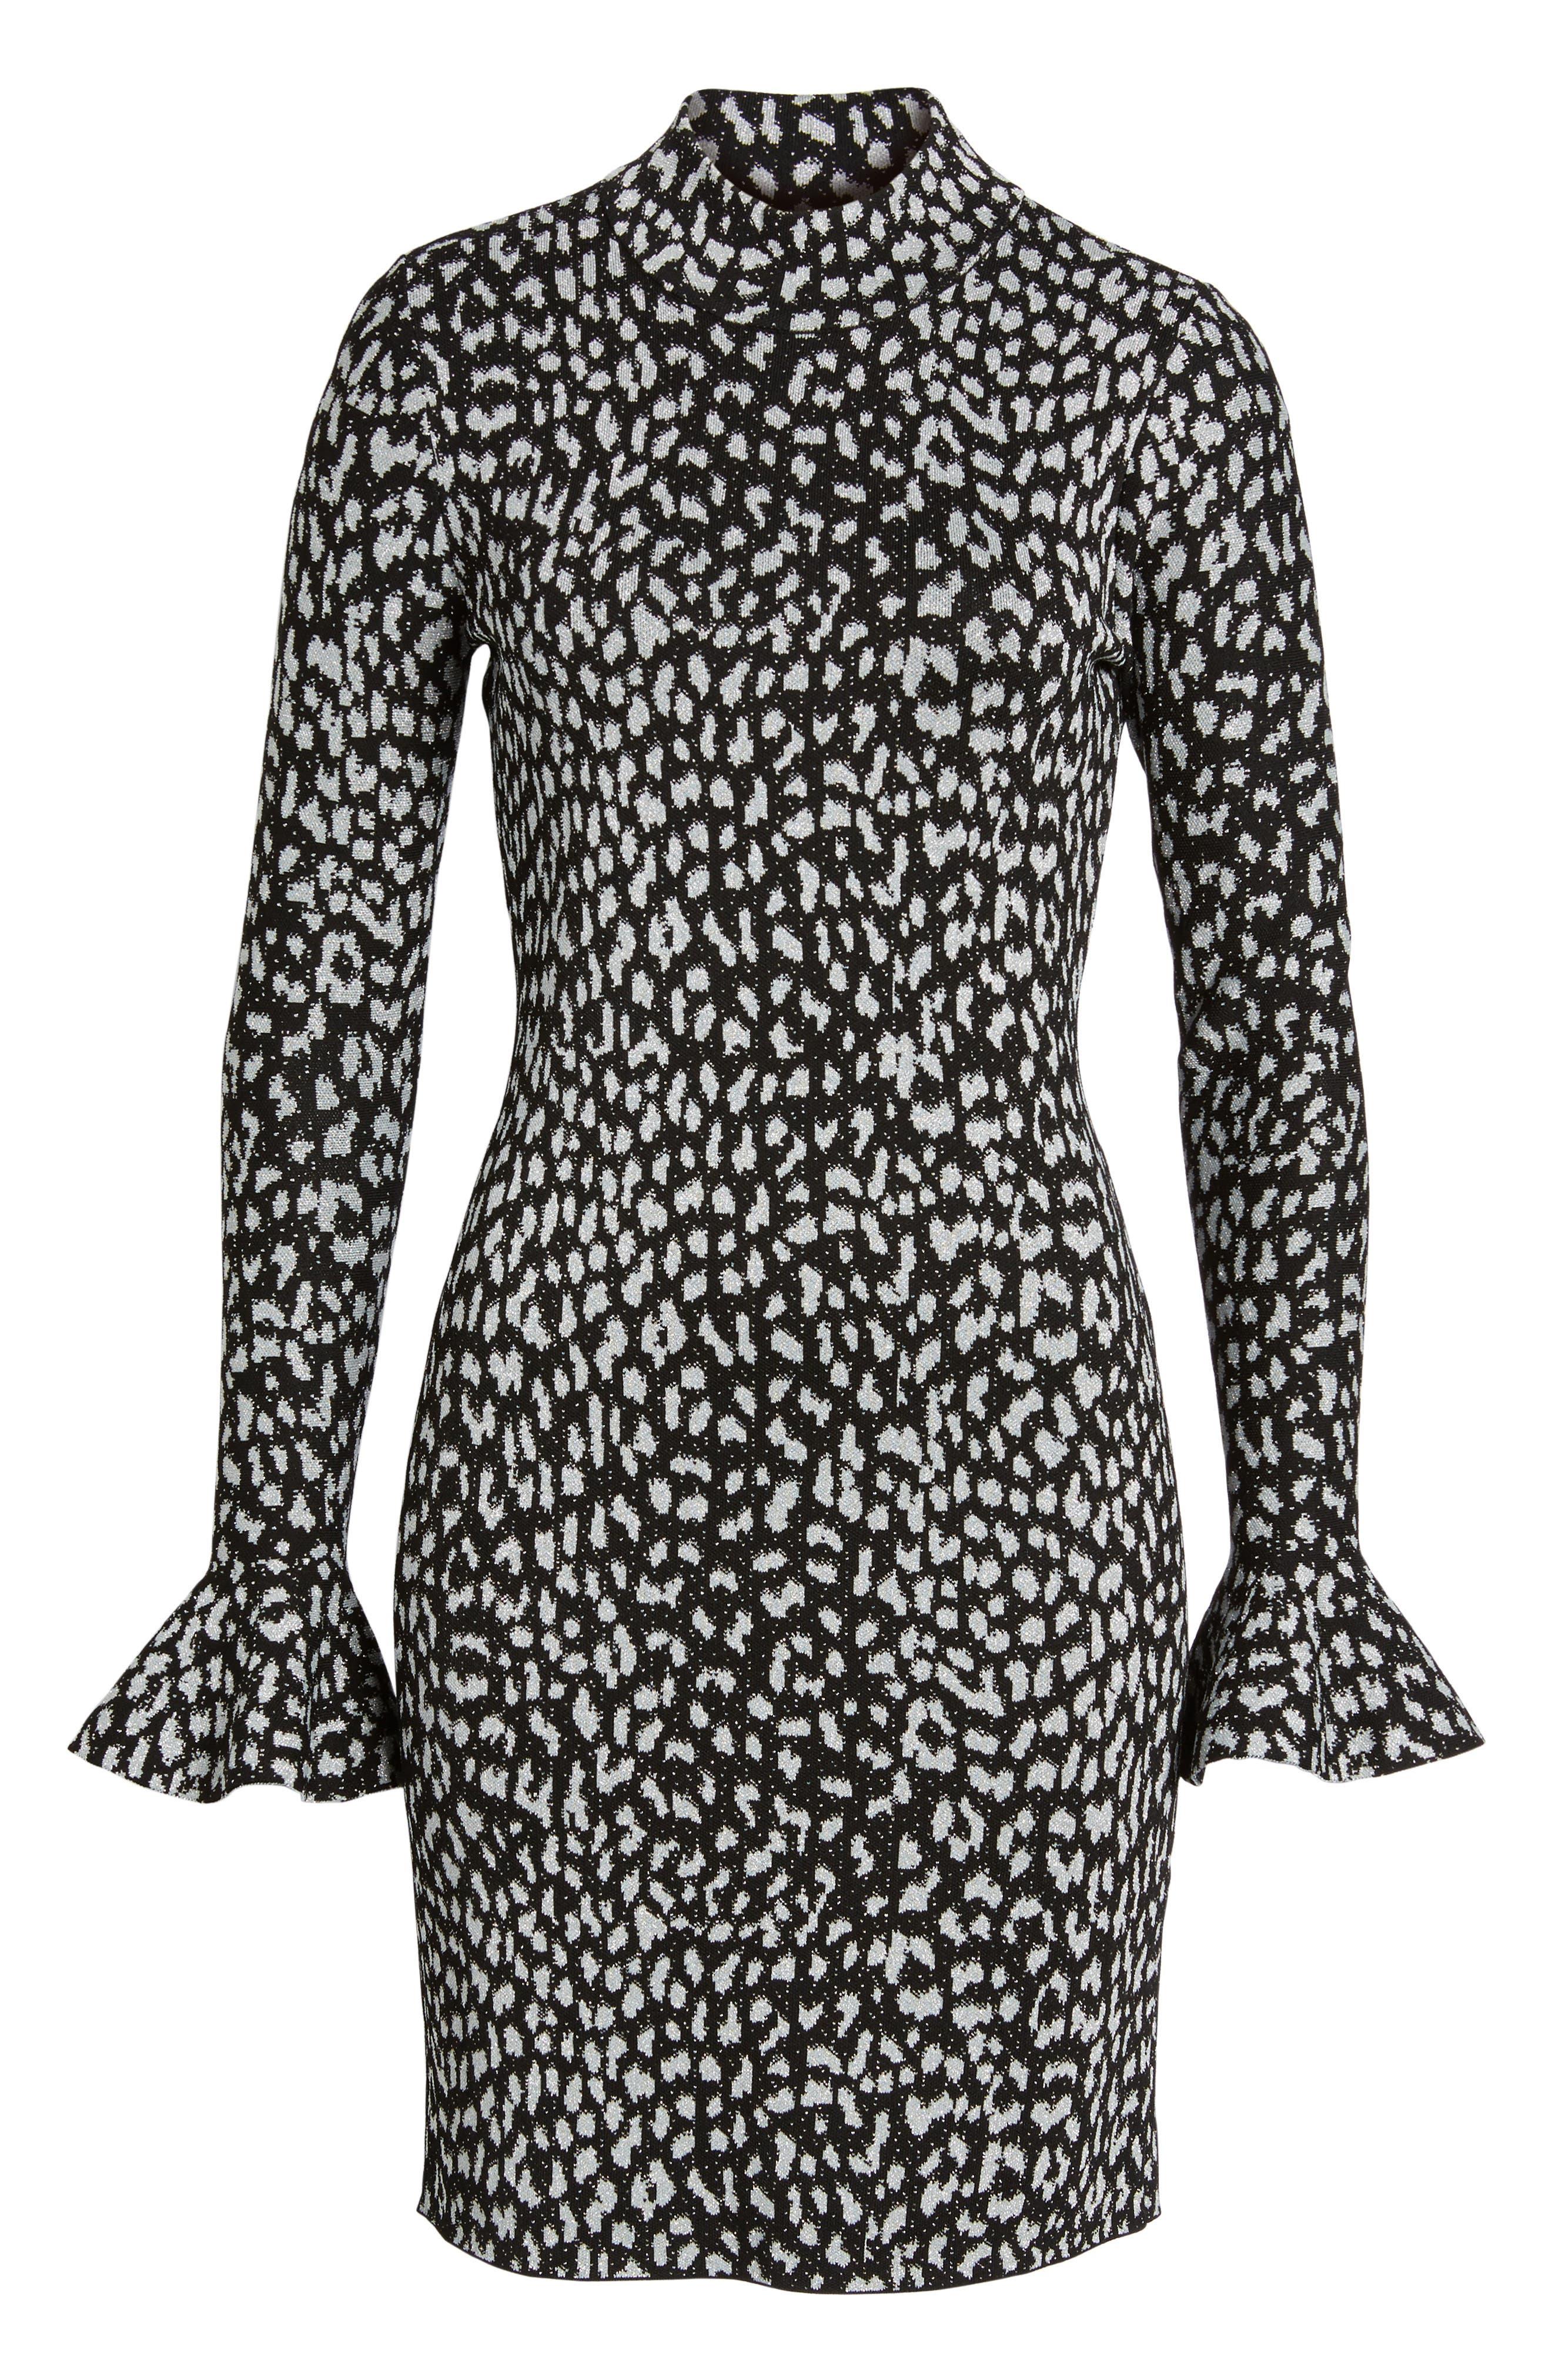 Metallic Cheetah Sheath Dress,                             Alternate thumbnail 6, color,                             Black